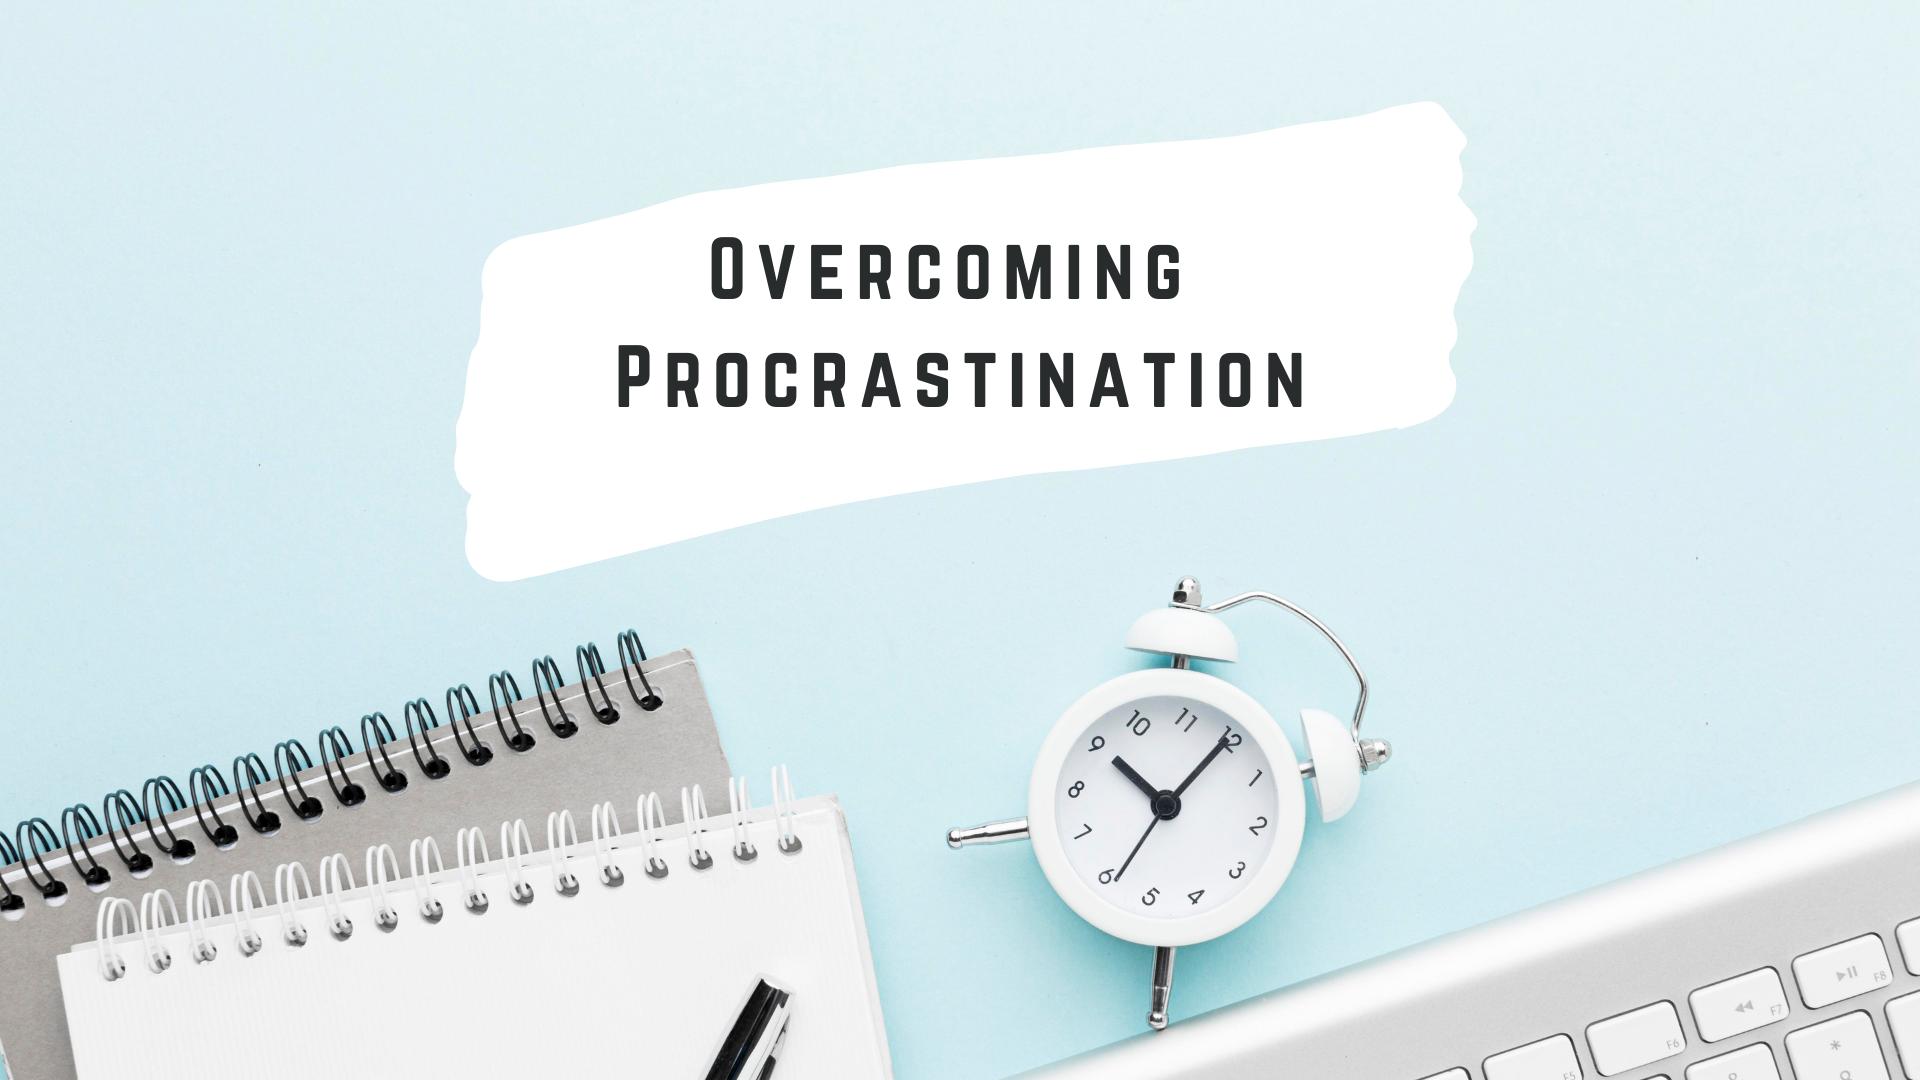 Overcoming  Procrastination course image